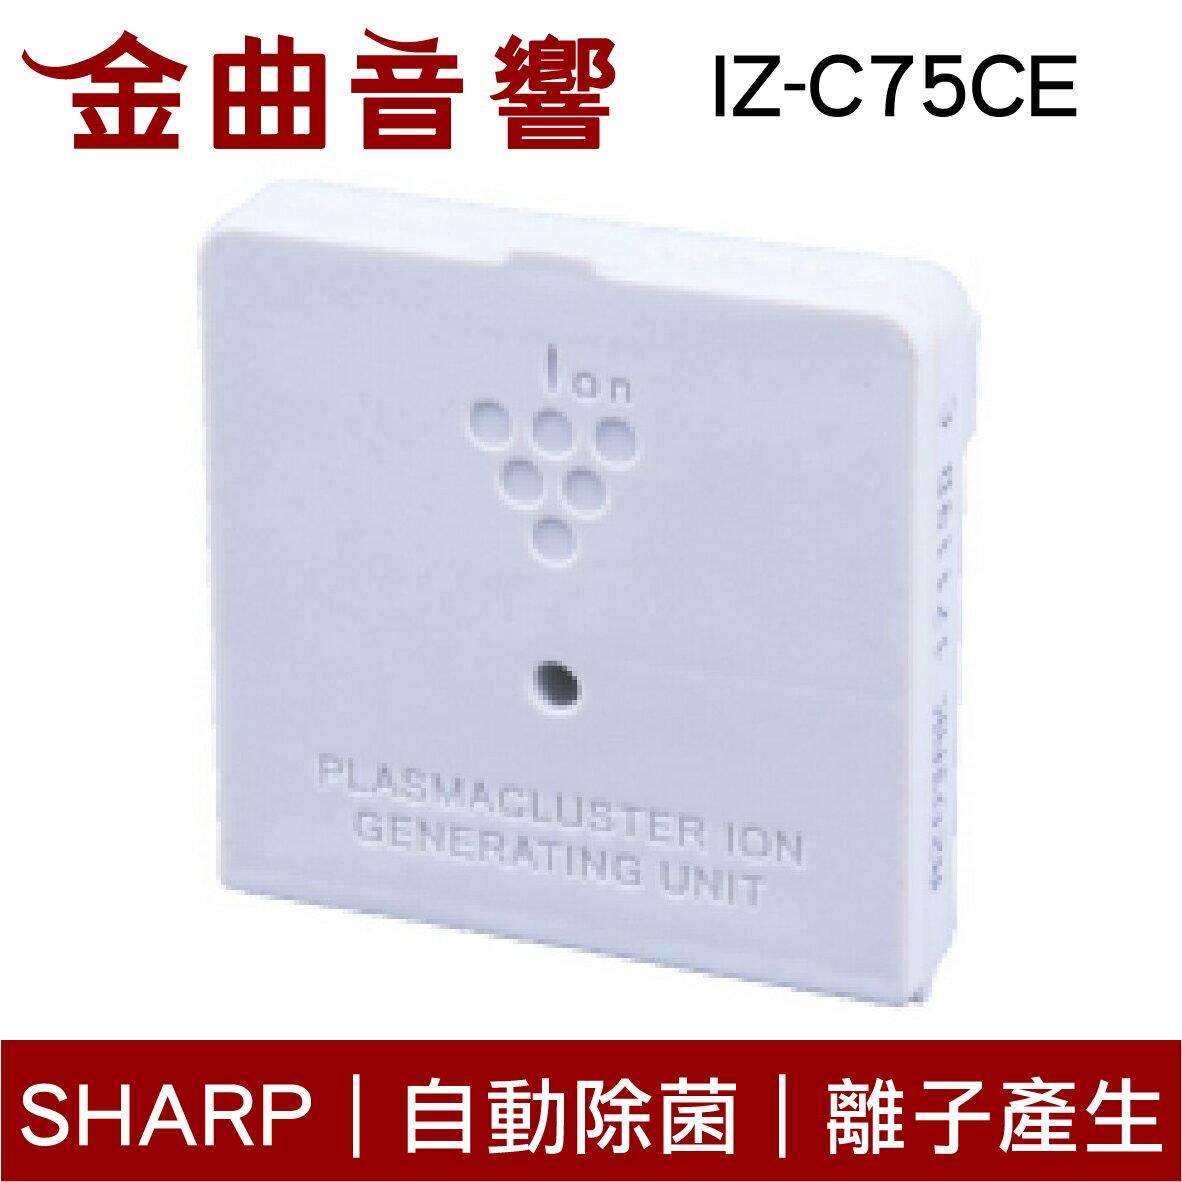 SHARP 夏普 IZ-C75CE 自動除菌離子產生器交換元件 | 金曲音響